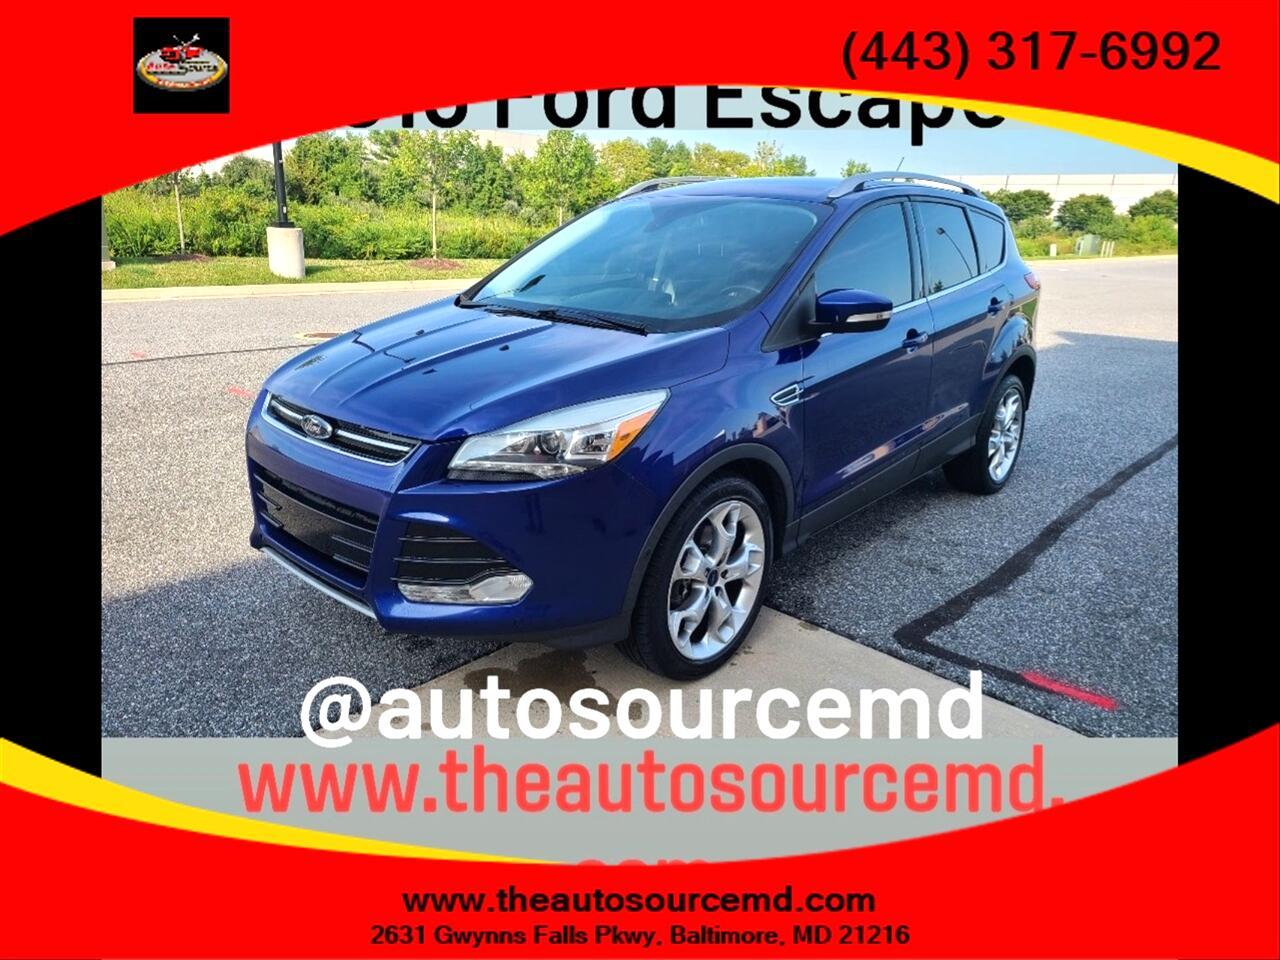 2015 Ford Escape Utility 4D Titanium EcoBoost 2.0L I4 Turbo